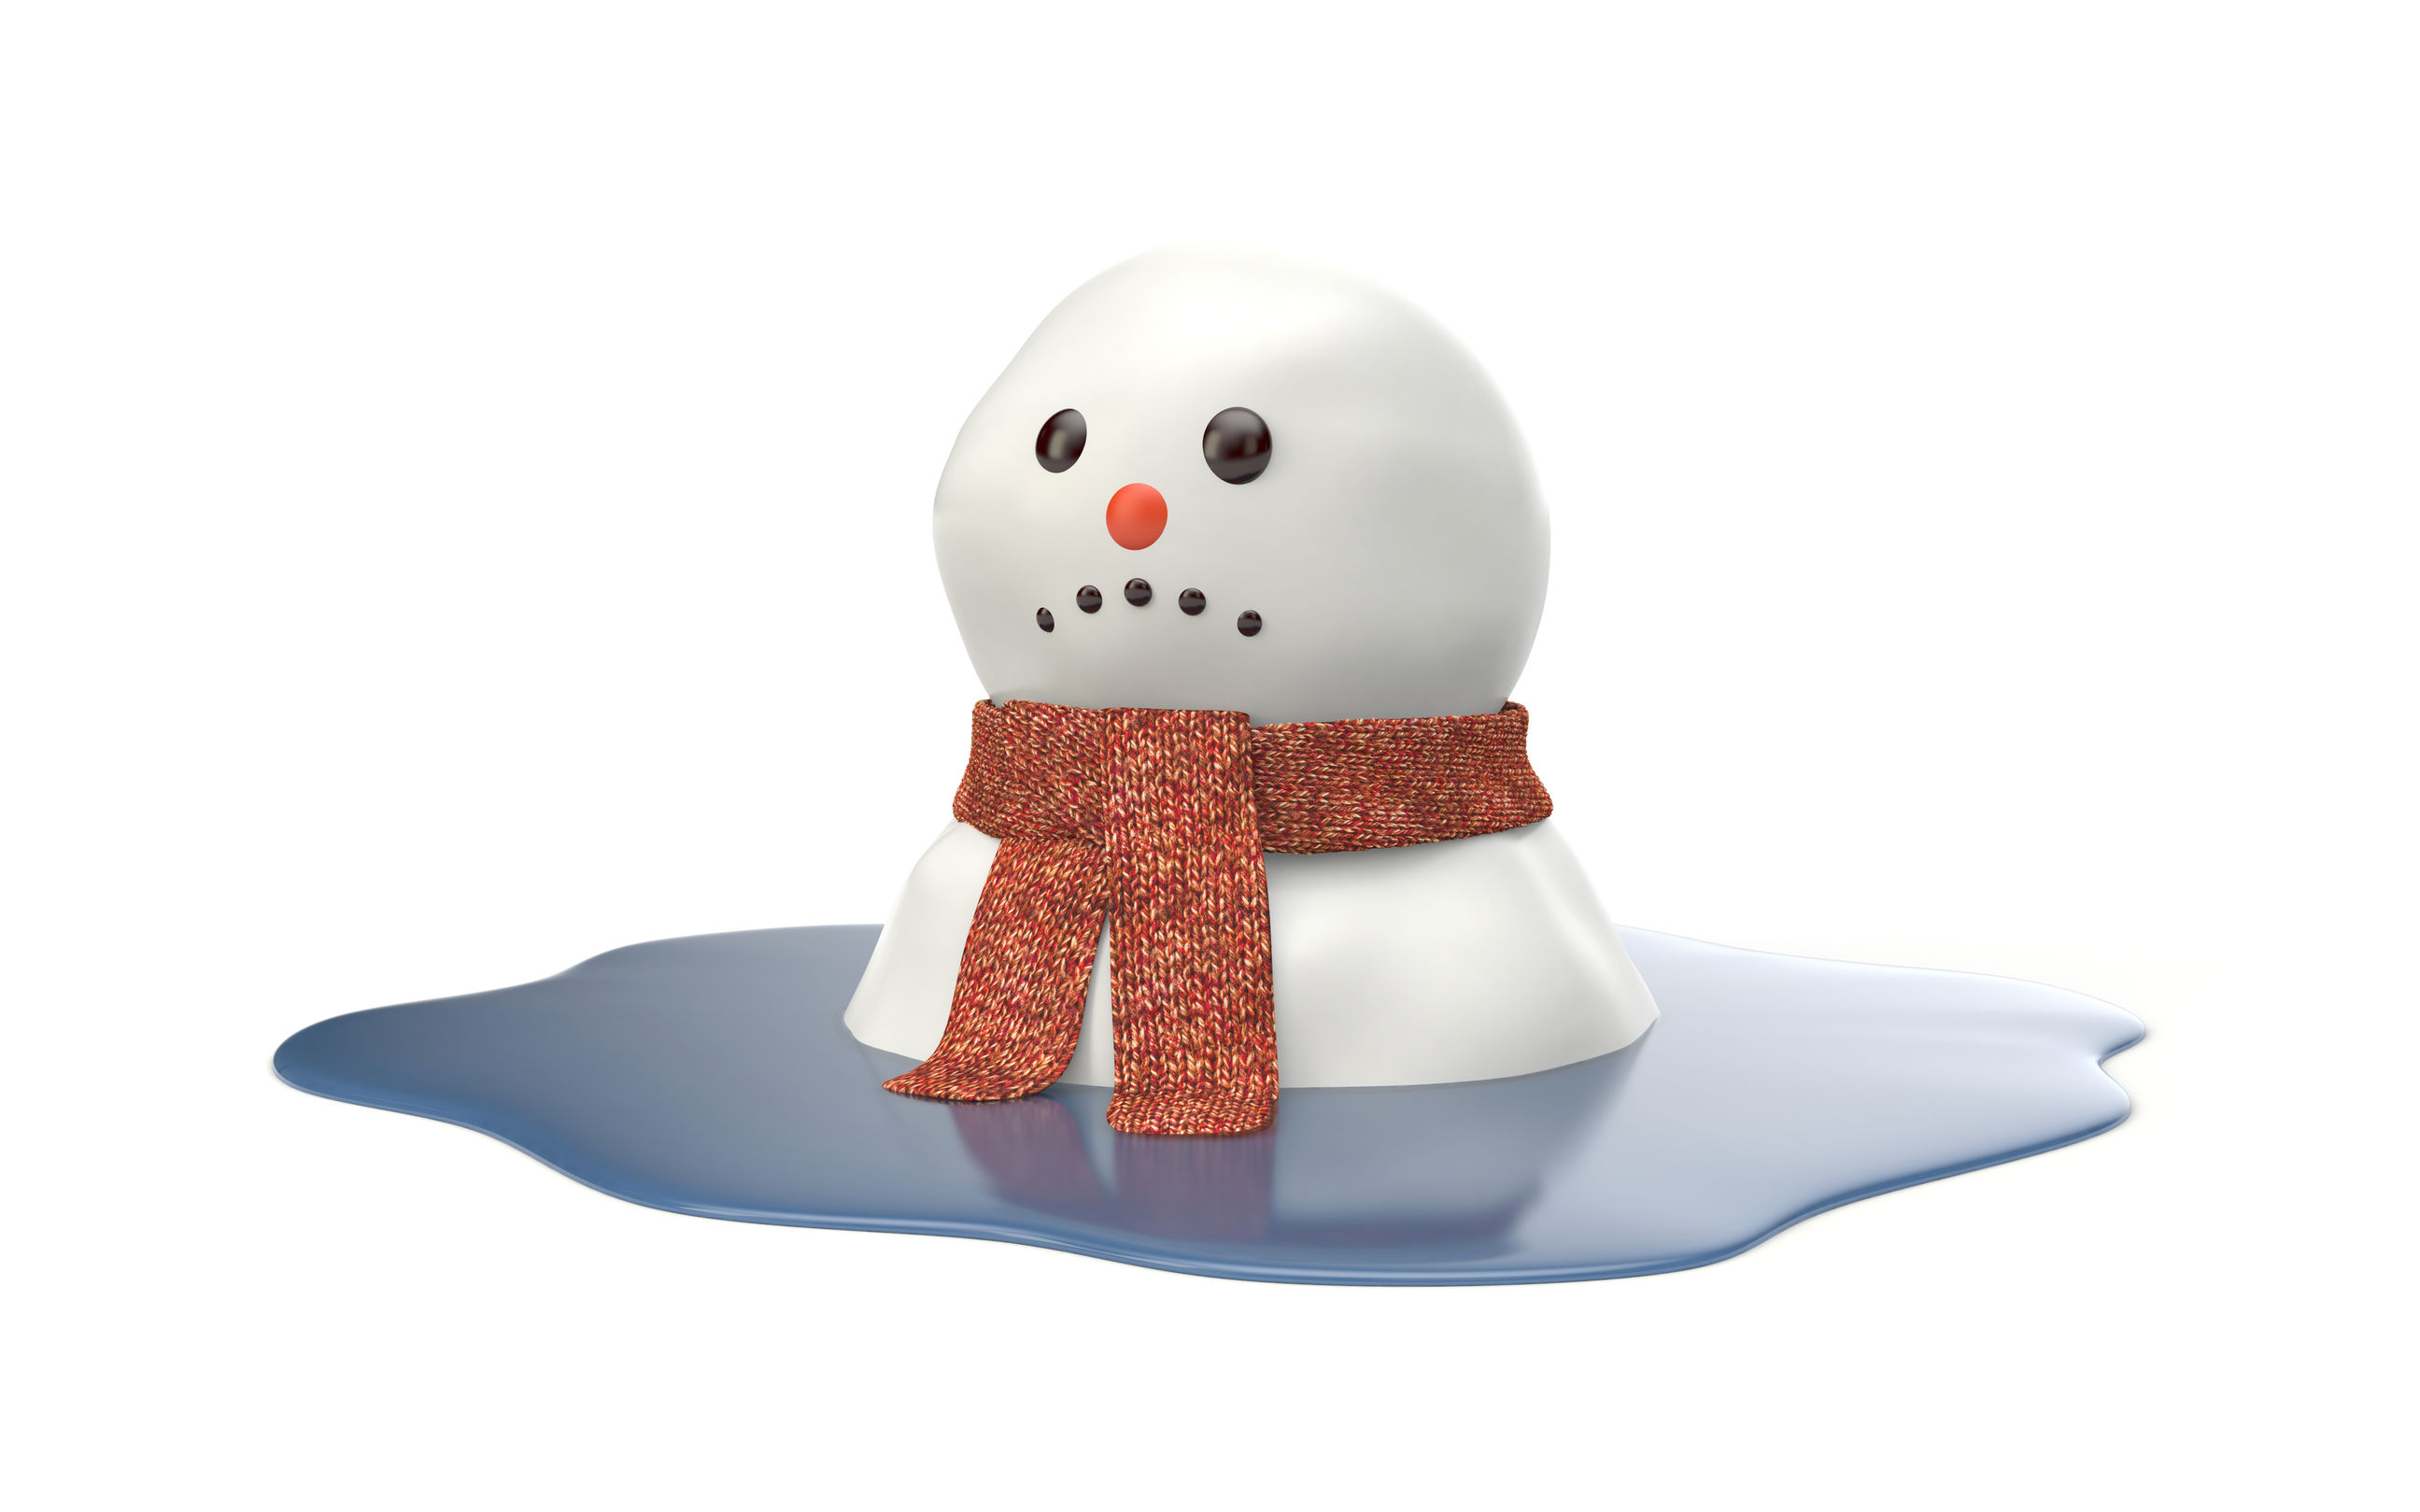 54905605 - snowman melting on white background